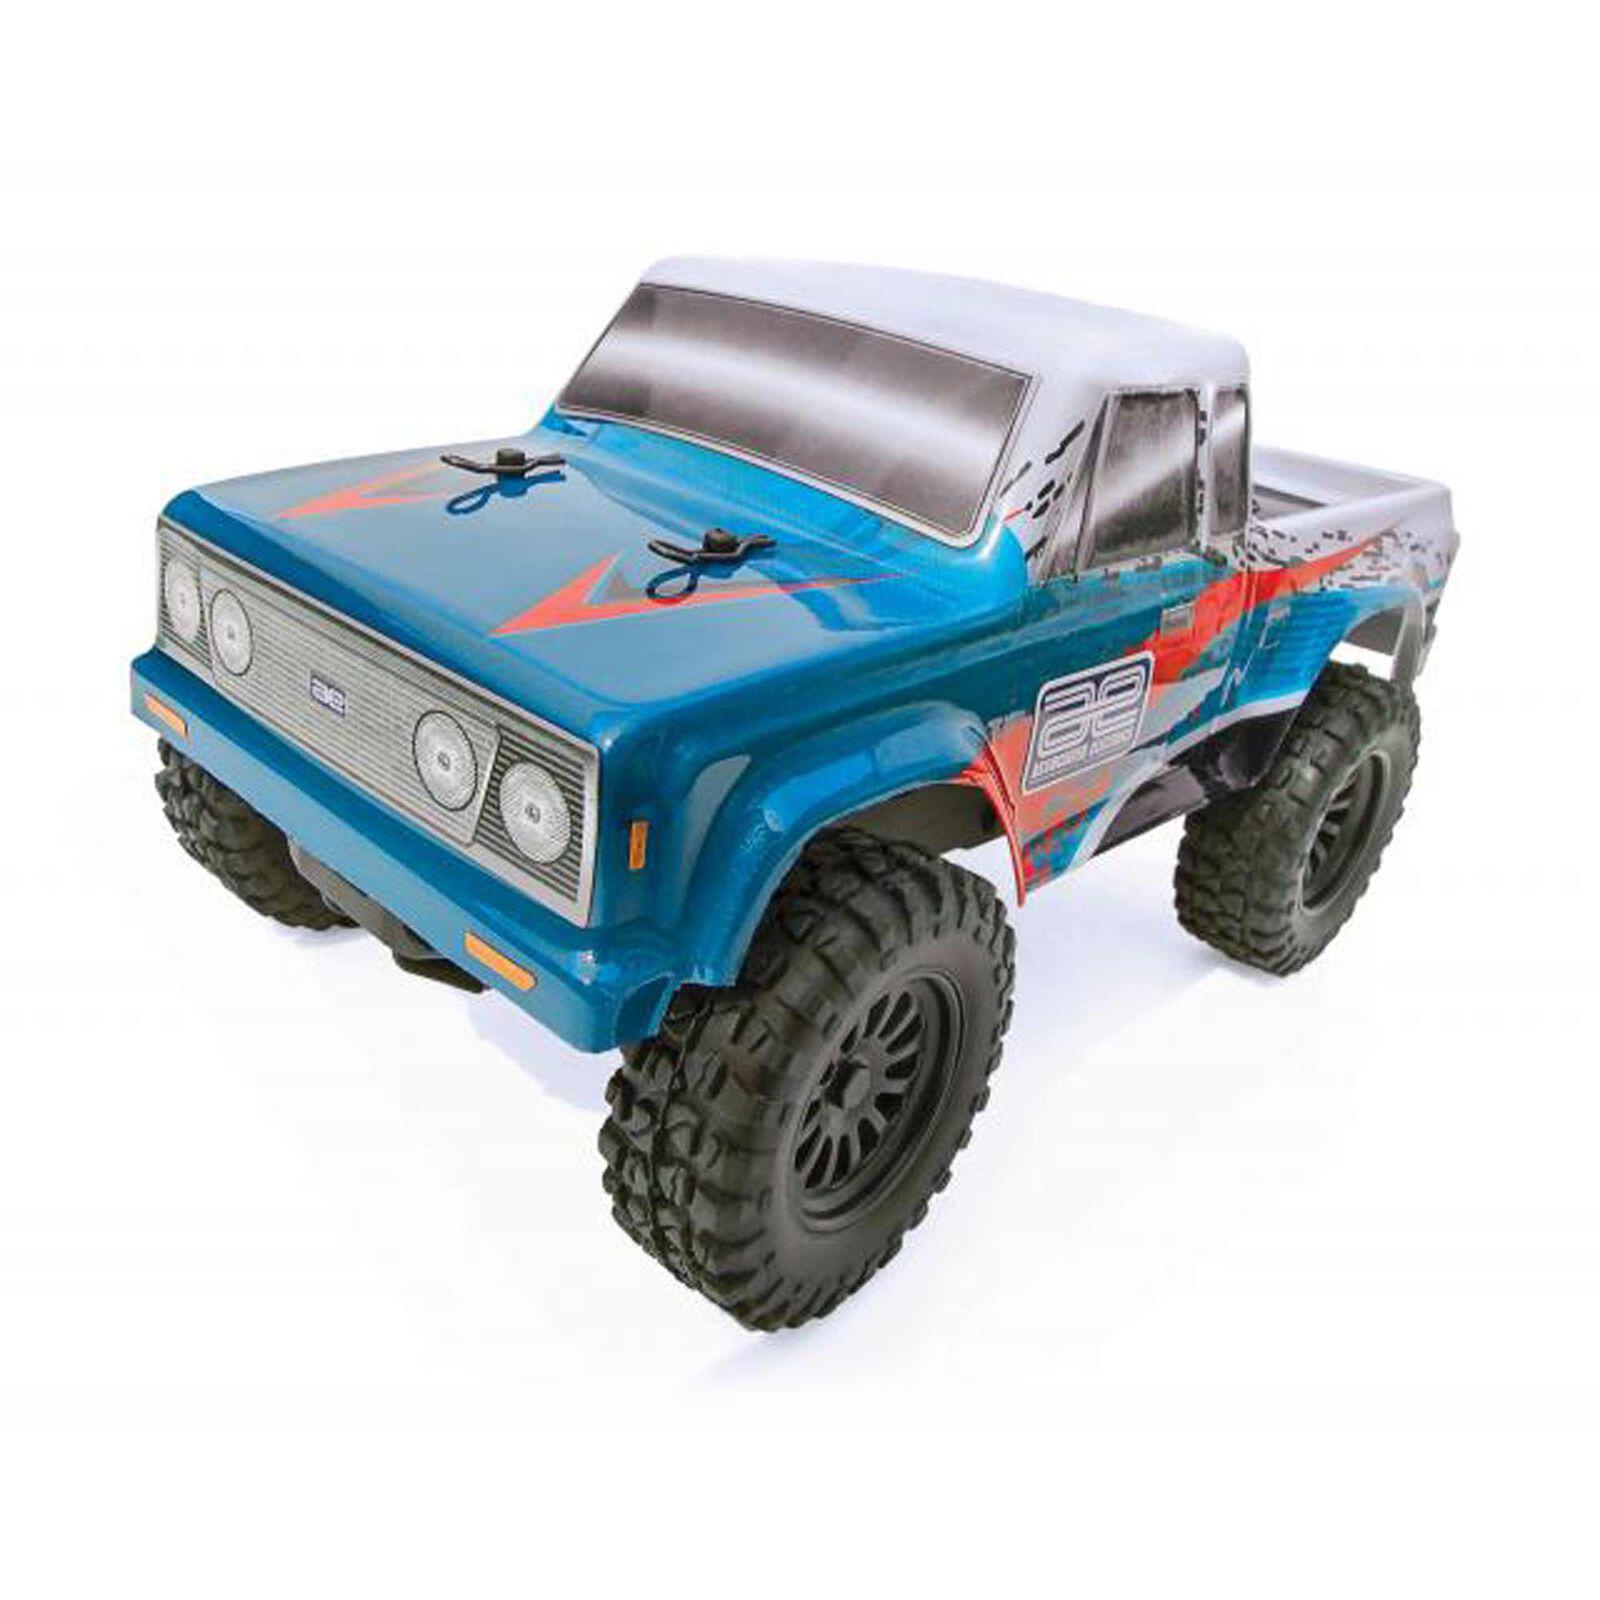 1/28 CR28 2WD Brushed Rock Crawler RTR